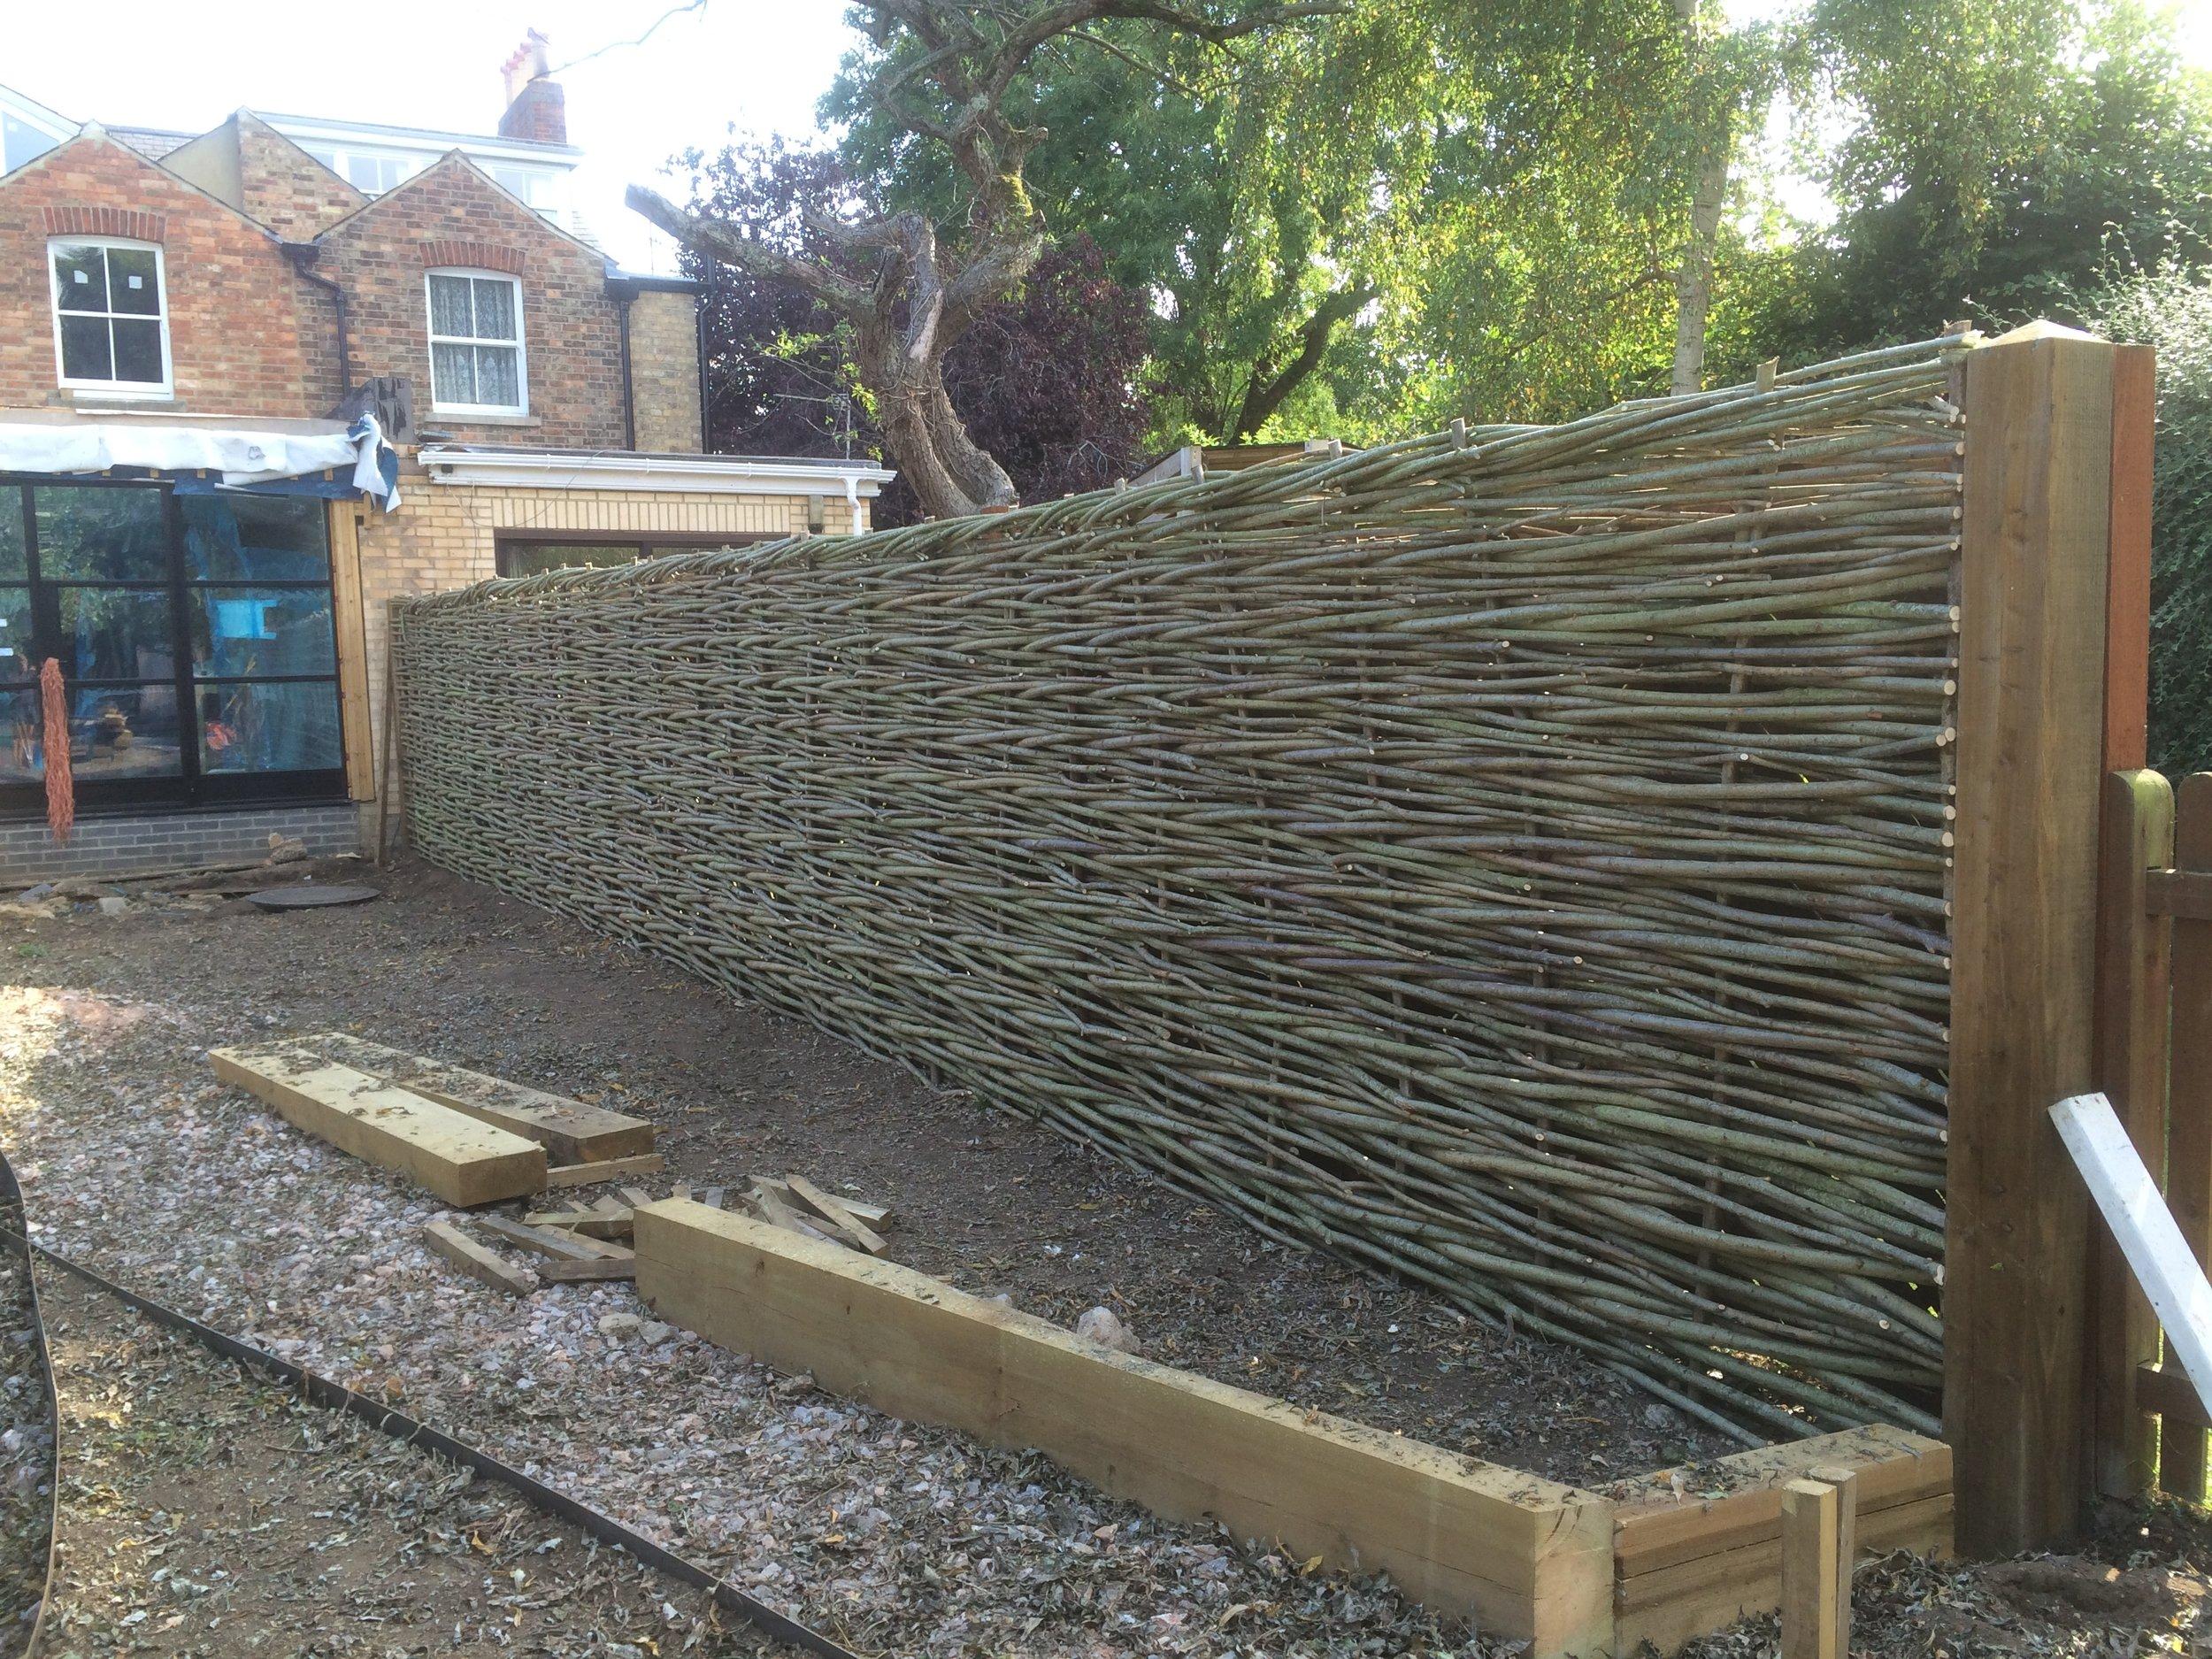 Willow fencing adding drama